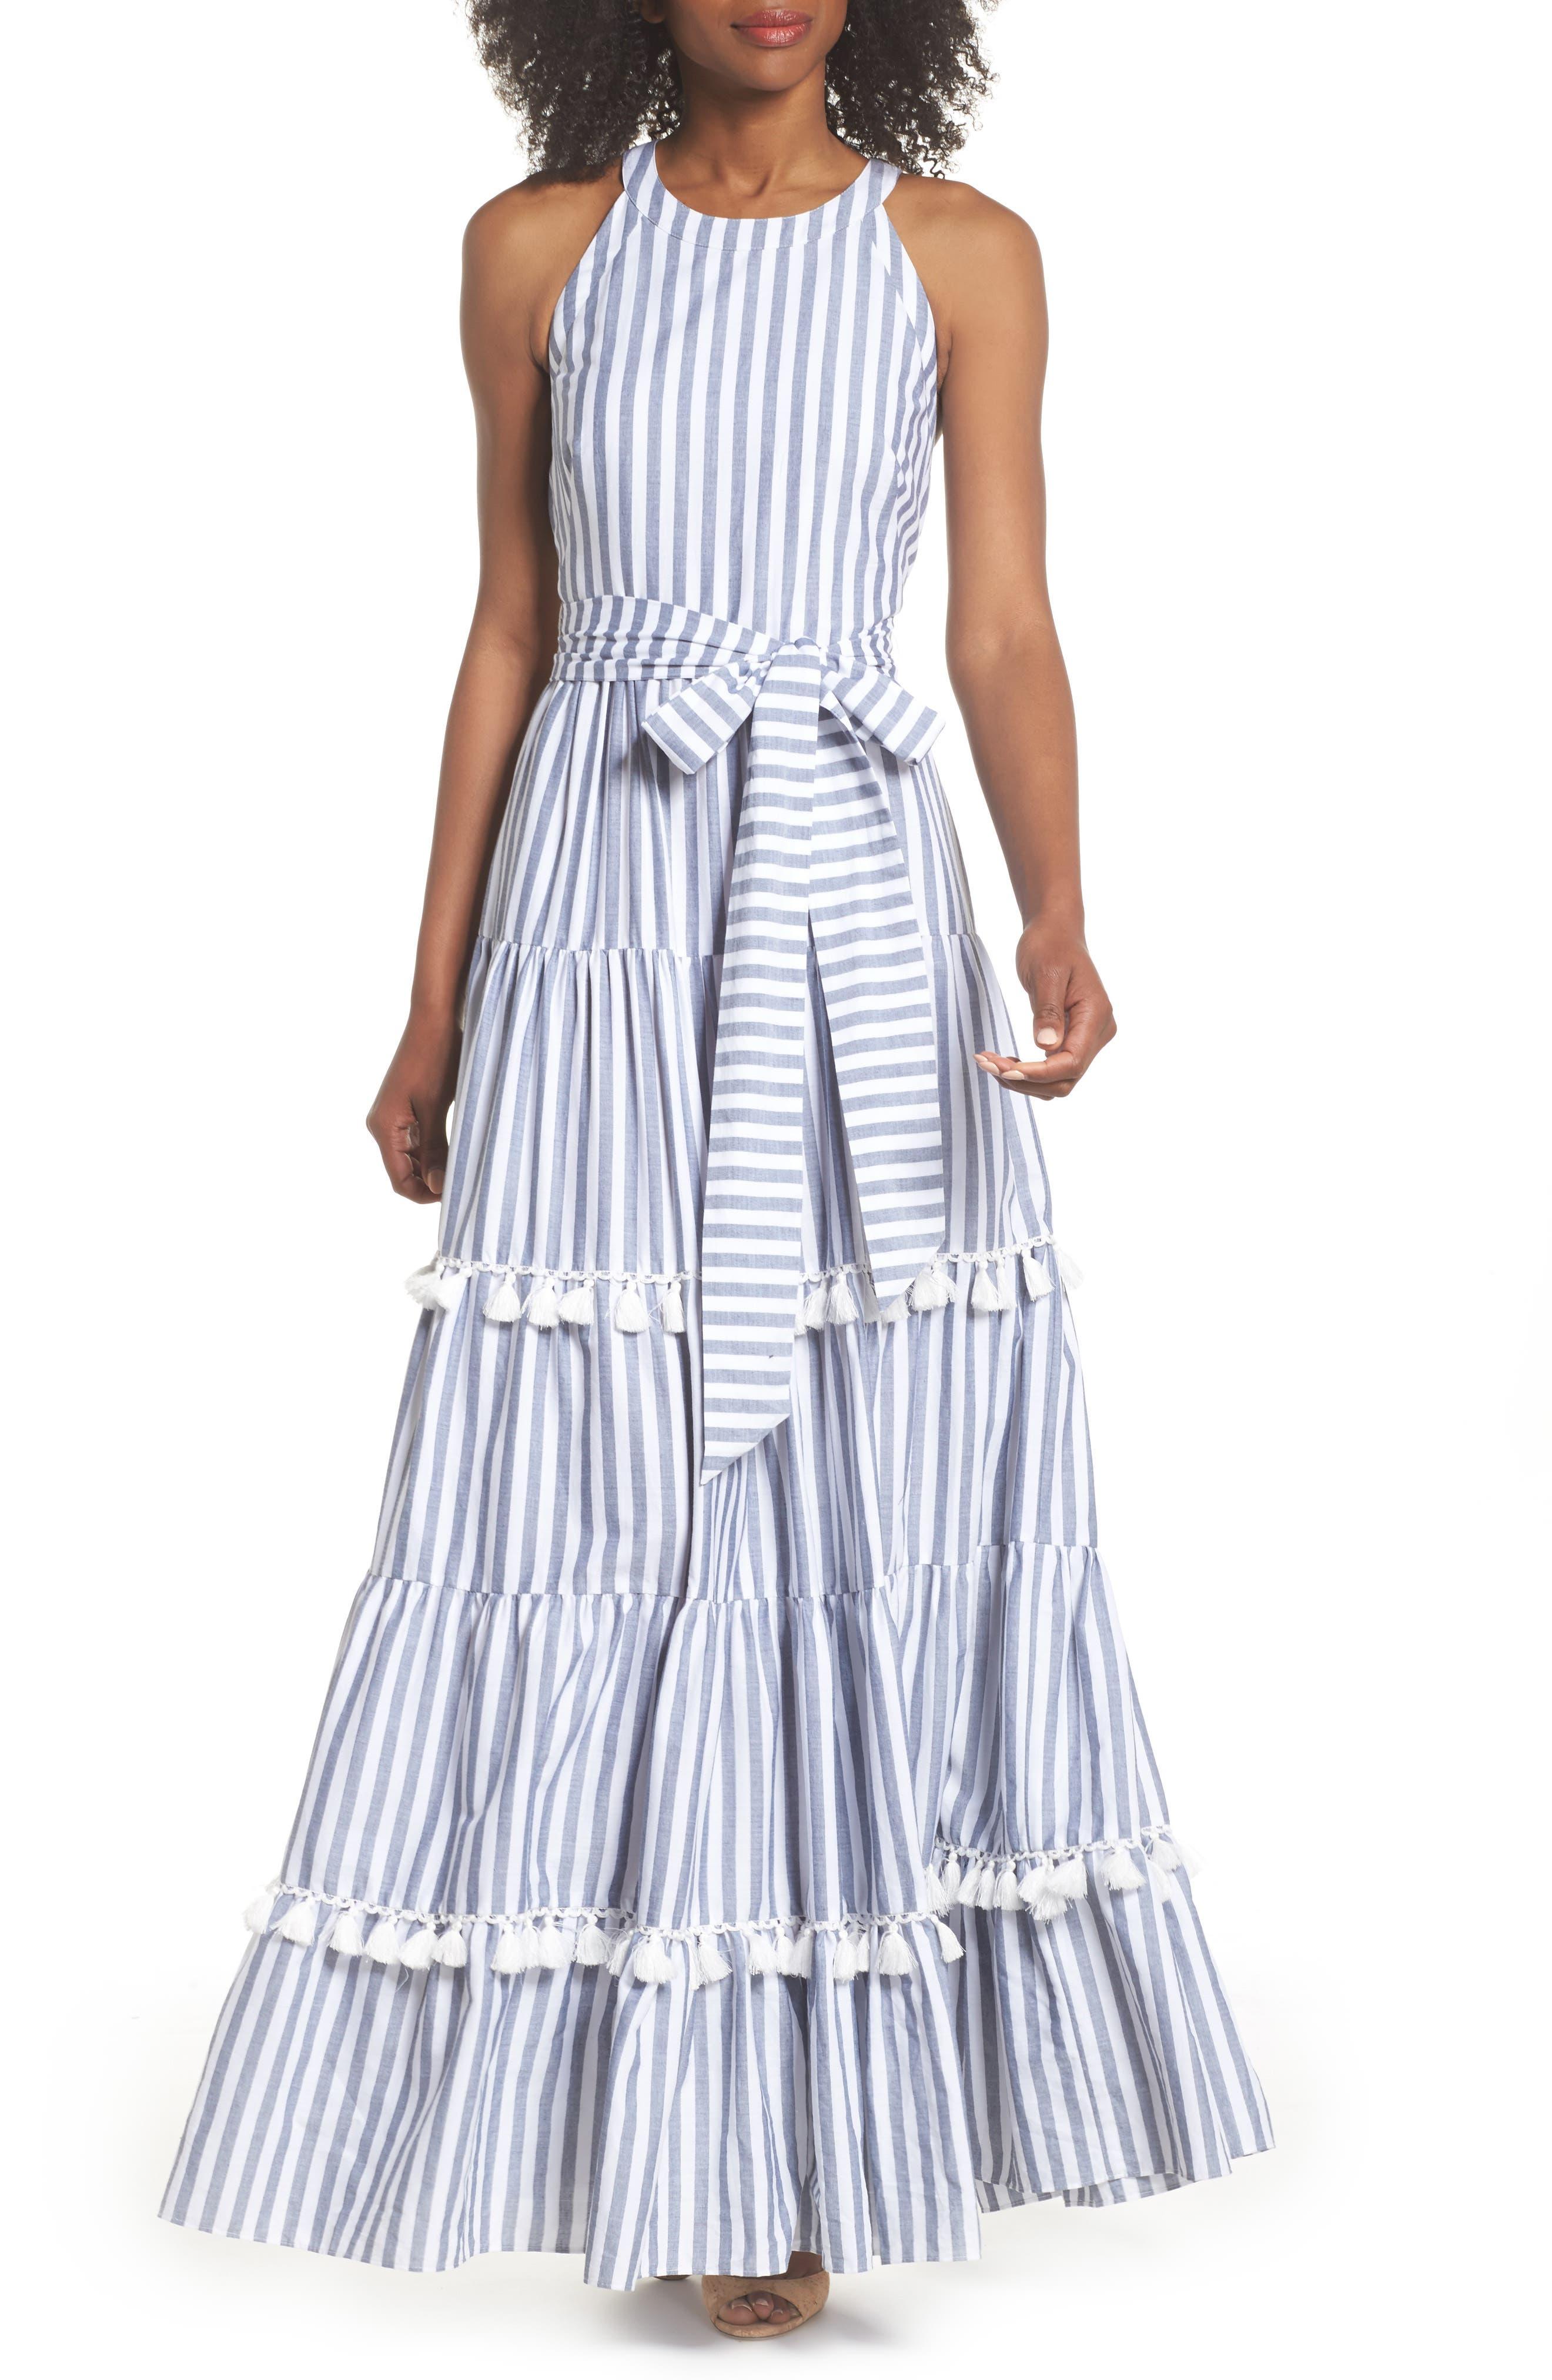 Tiered Tassel Fringe Cotton Maxi Dress by Eliza J